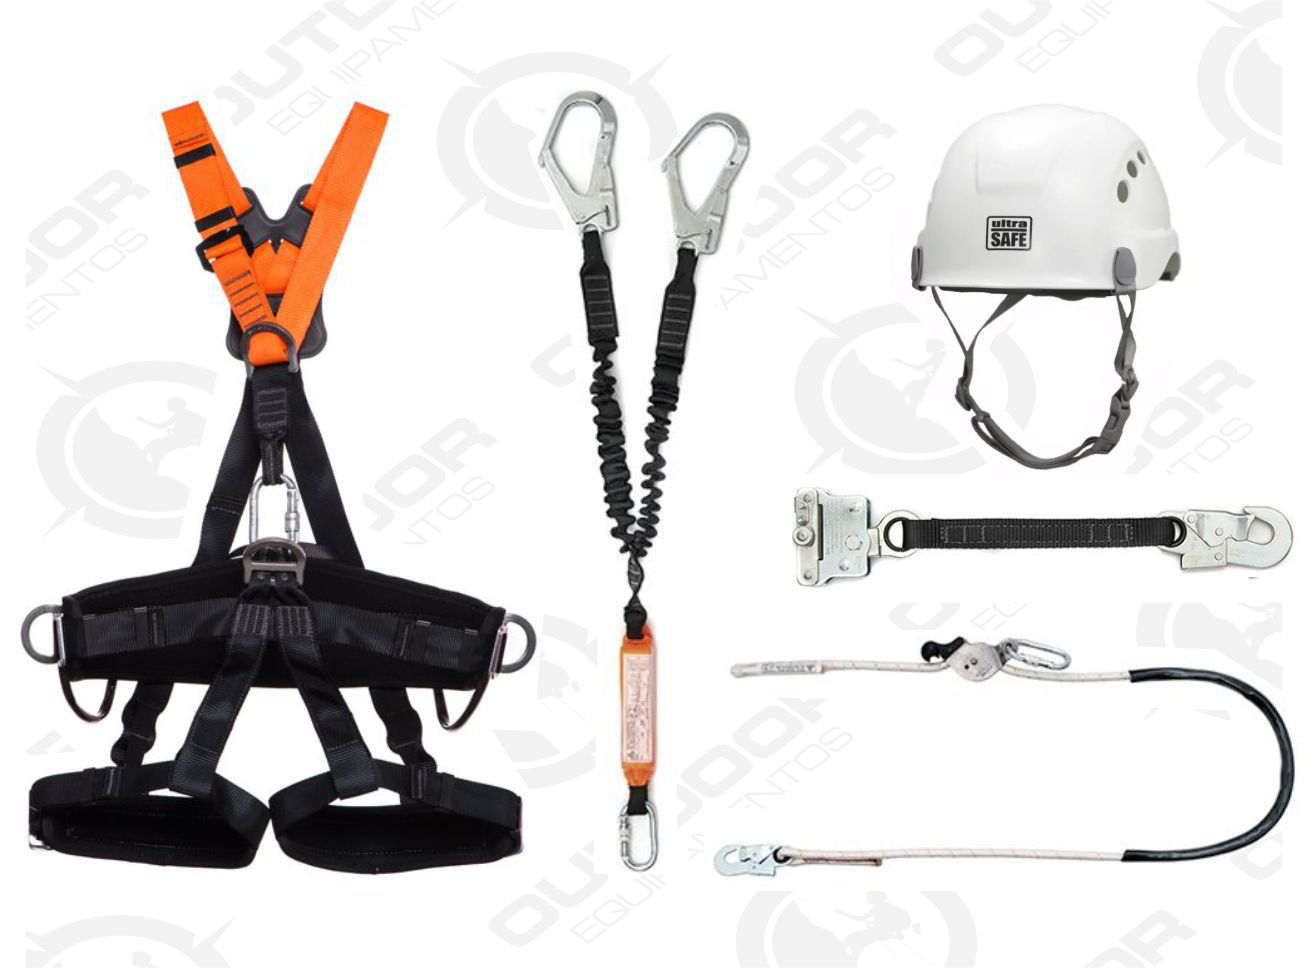 Cinto Paraquedista Talabartes Trava Quedas Capacate Kit Altura 12 Completo